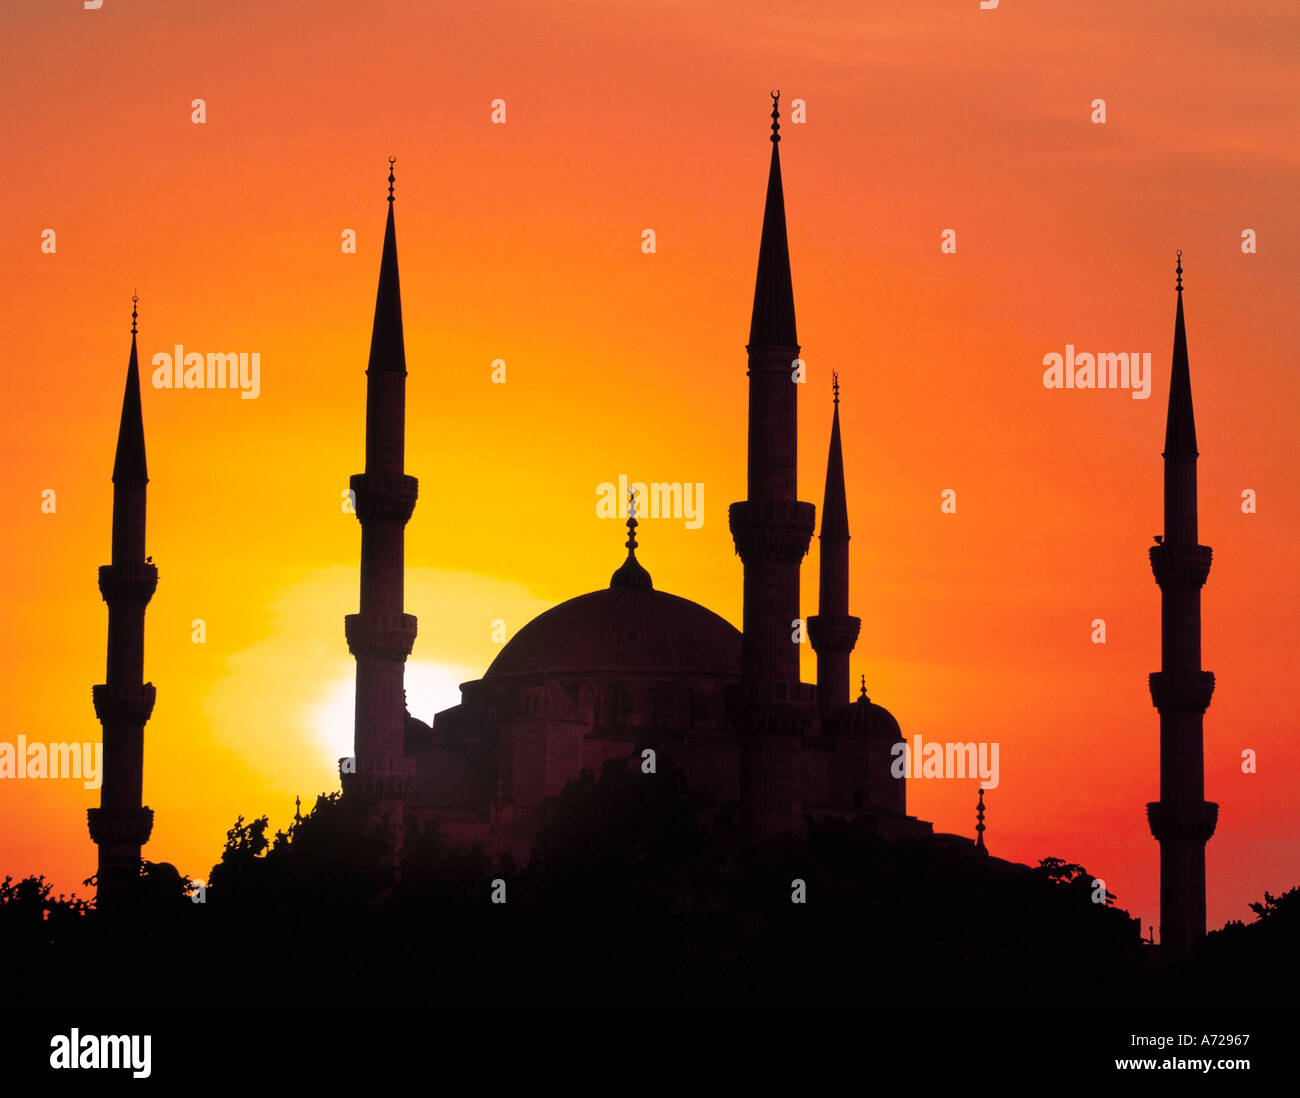 Sultan Ahmet Camii Mosque Blue Mosque in Istanbul Turkey - Stock Image